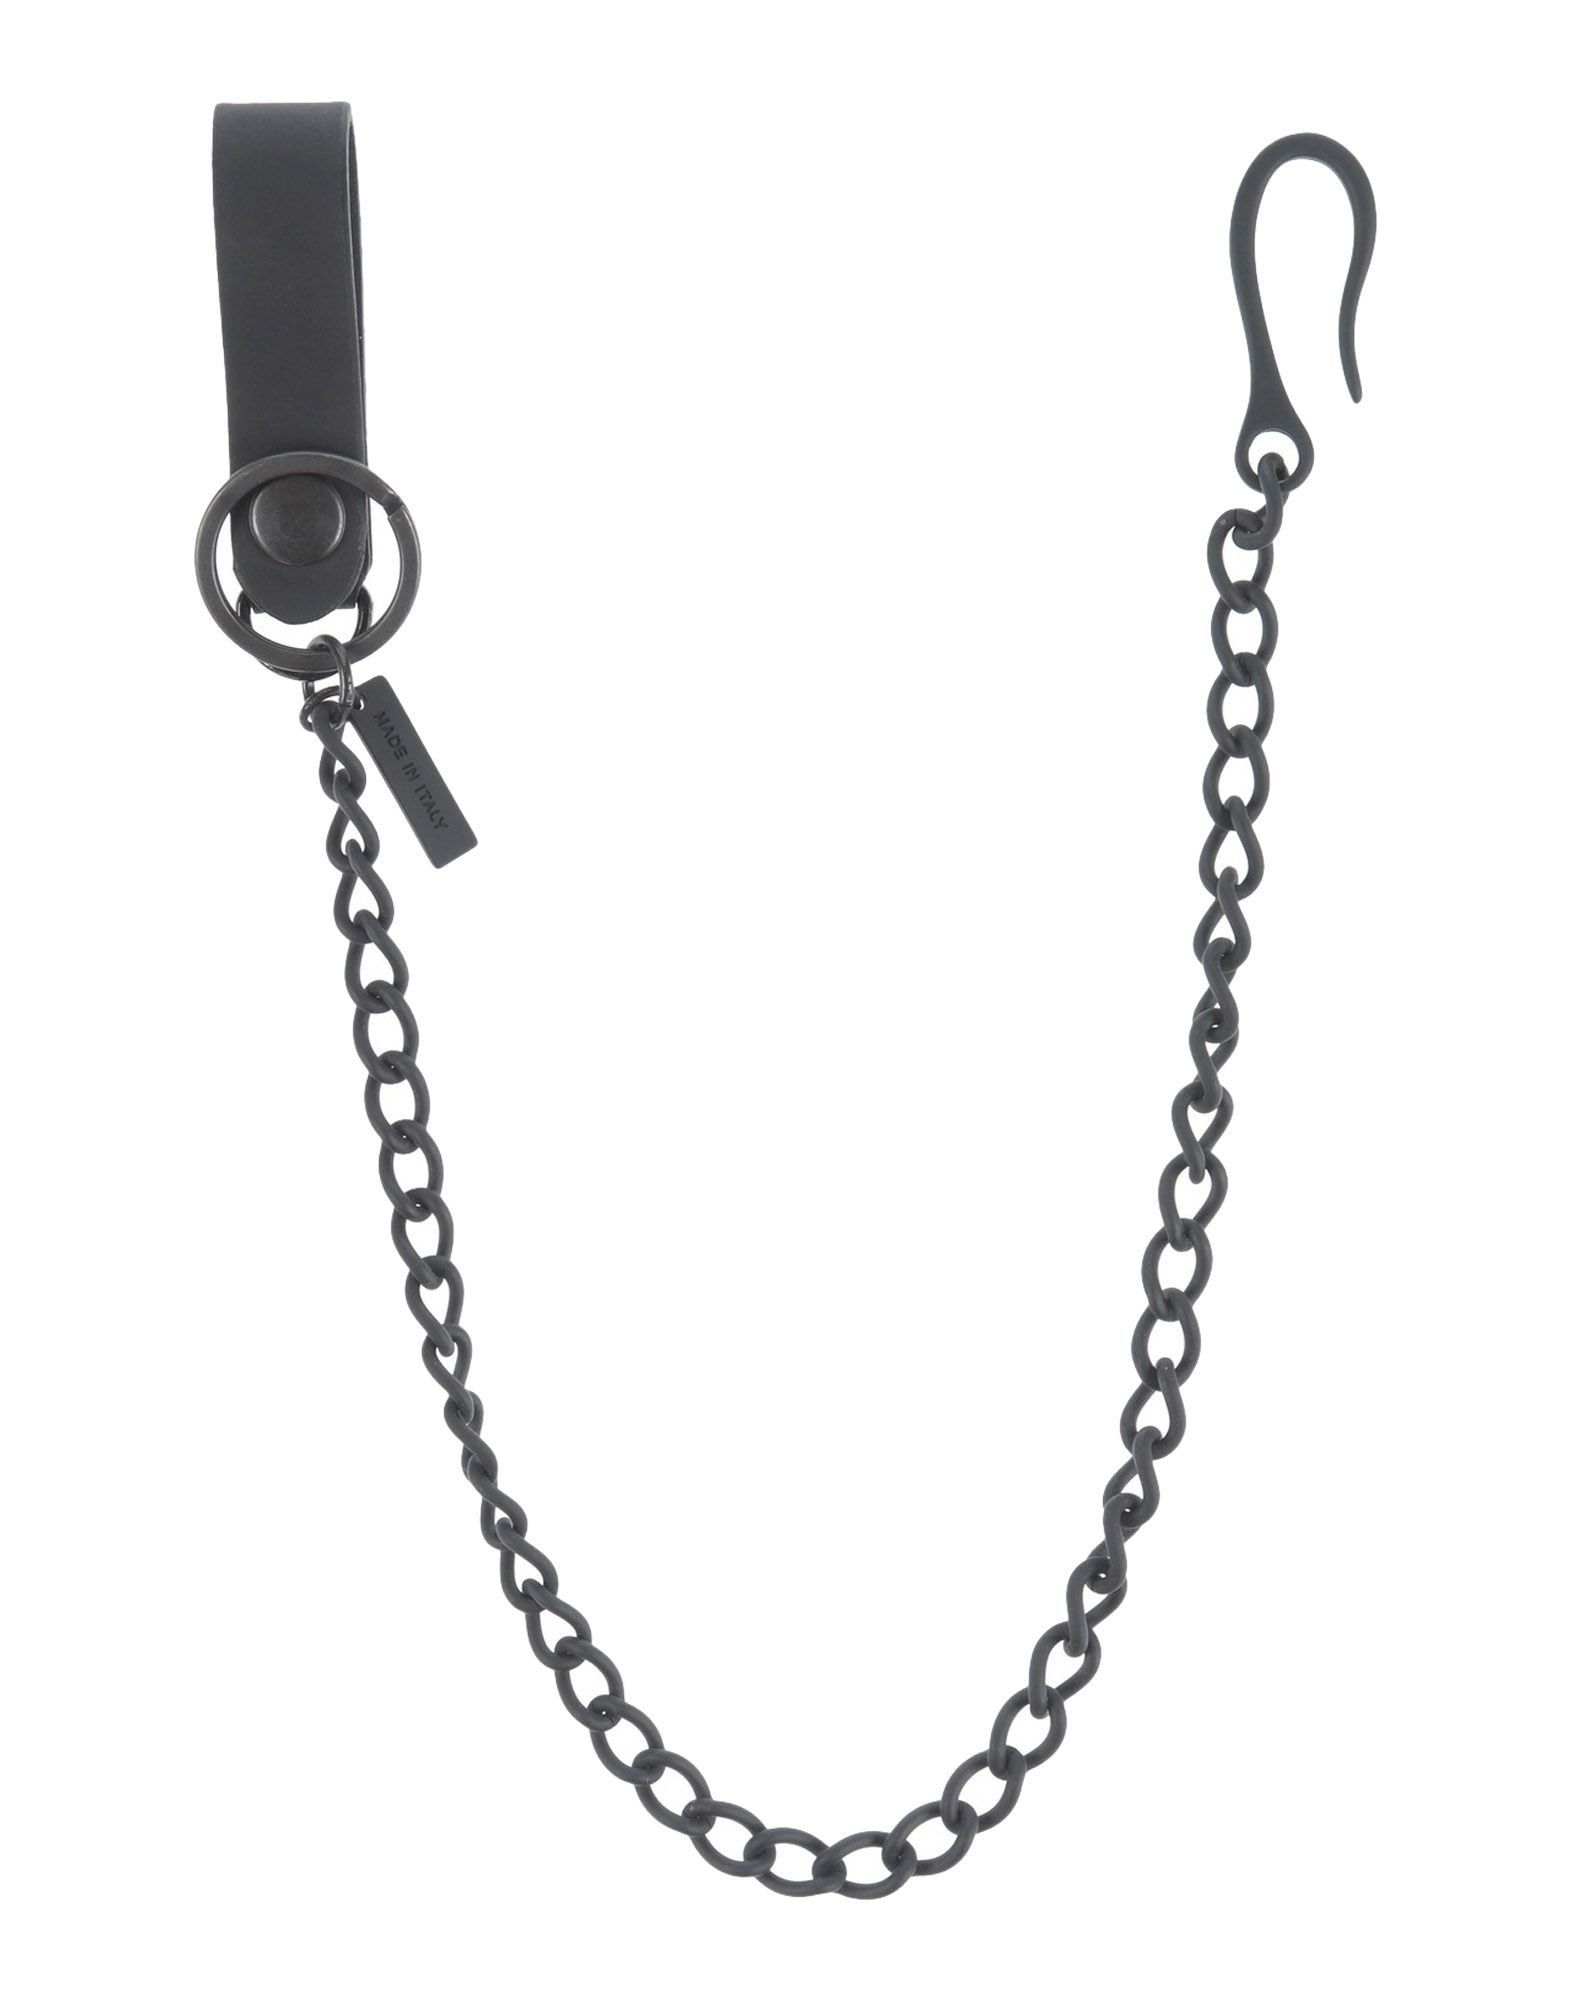 DSQUARED2 Key rings